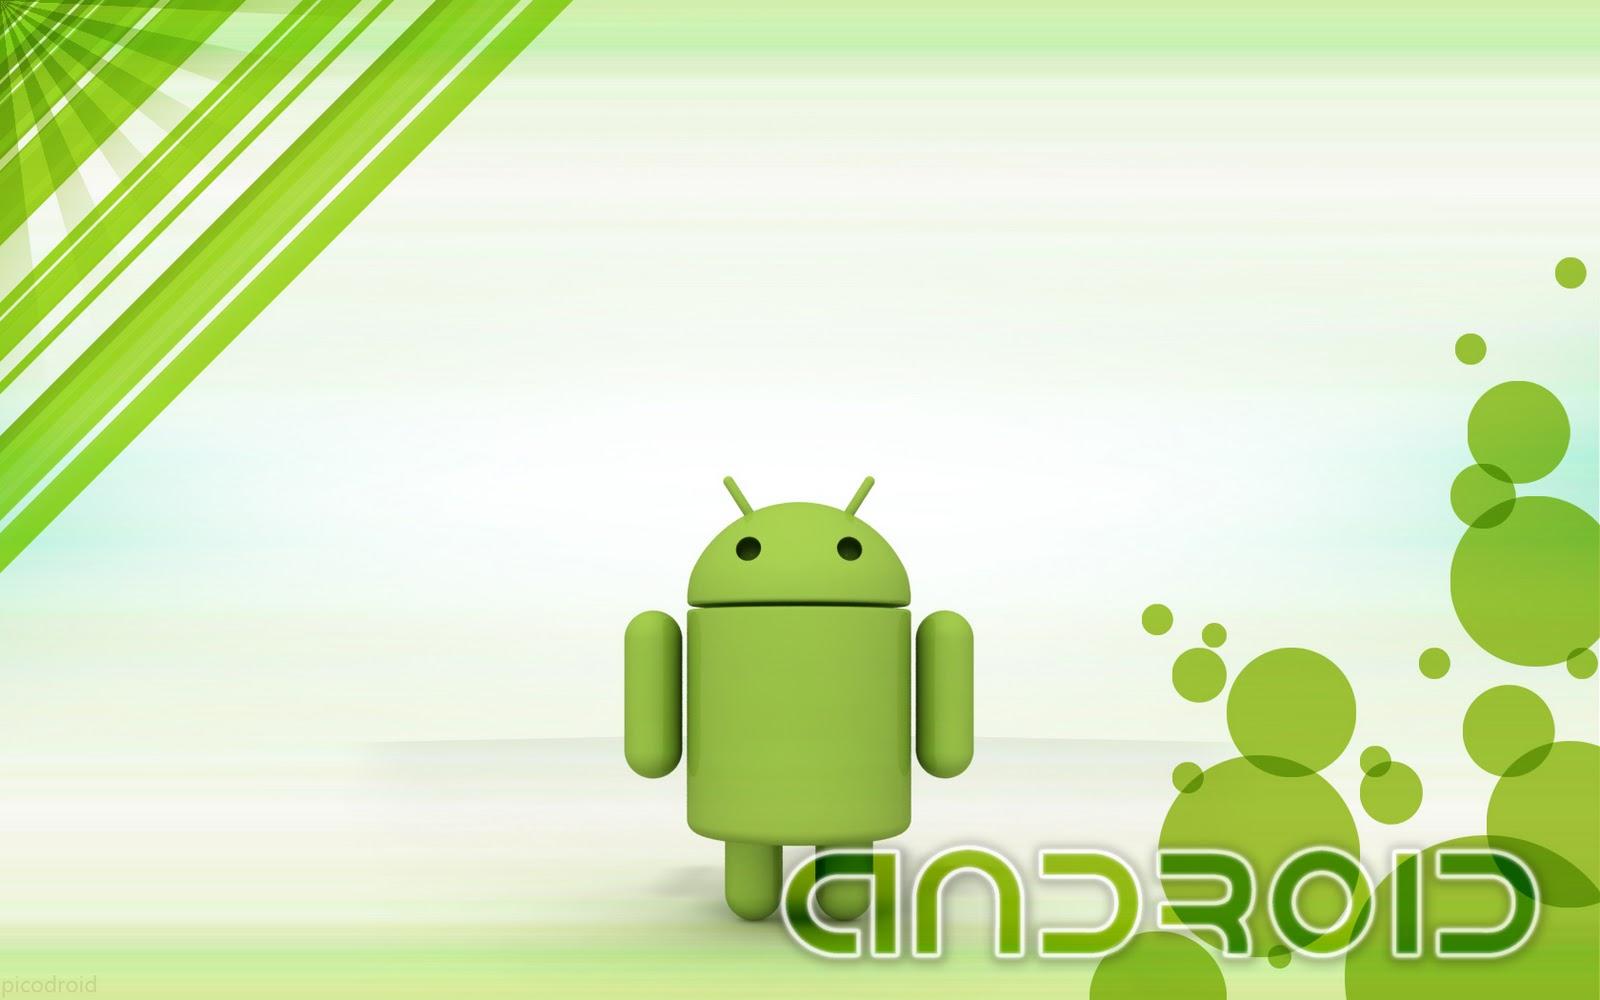 http://4.bp.blogspot.com/-oF-ztrAUlHo/TykRCIs5epI/AAAAAAAAAxM/UliX5fM9YEY/s1600/love+android-wallpaper-21.jpg